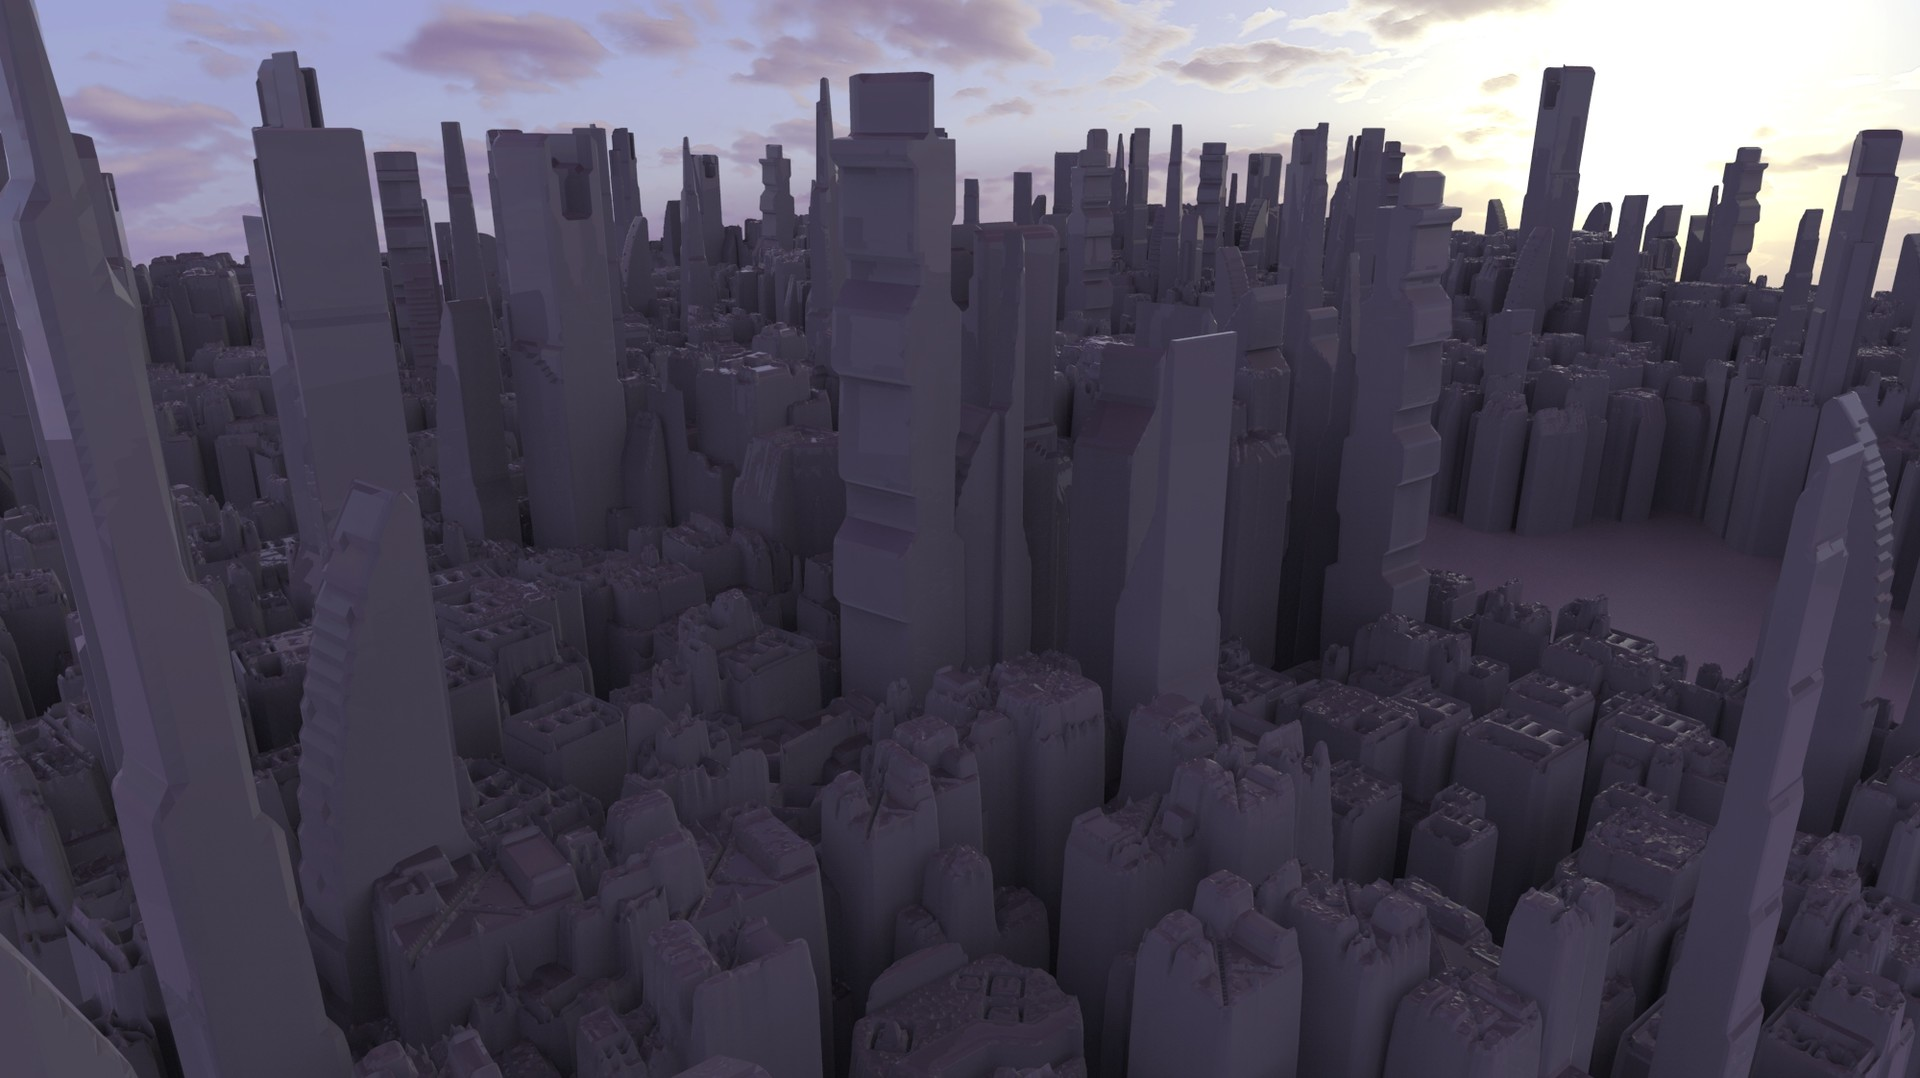 Alejandro gonzalez city scene 222